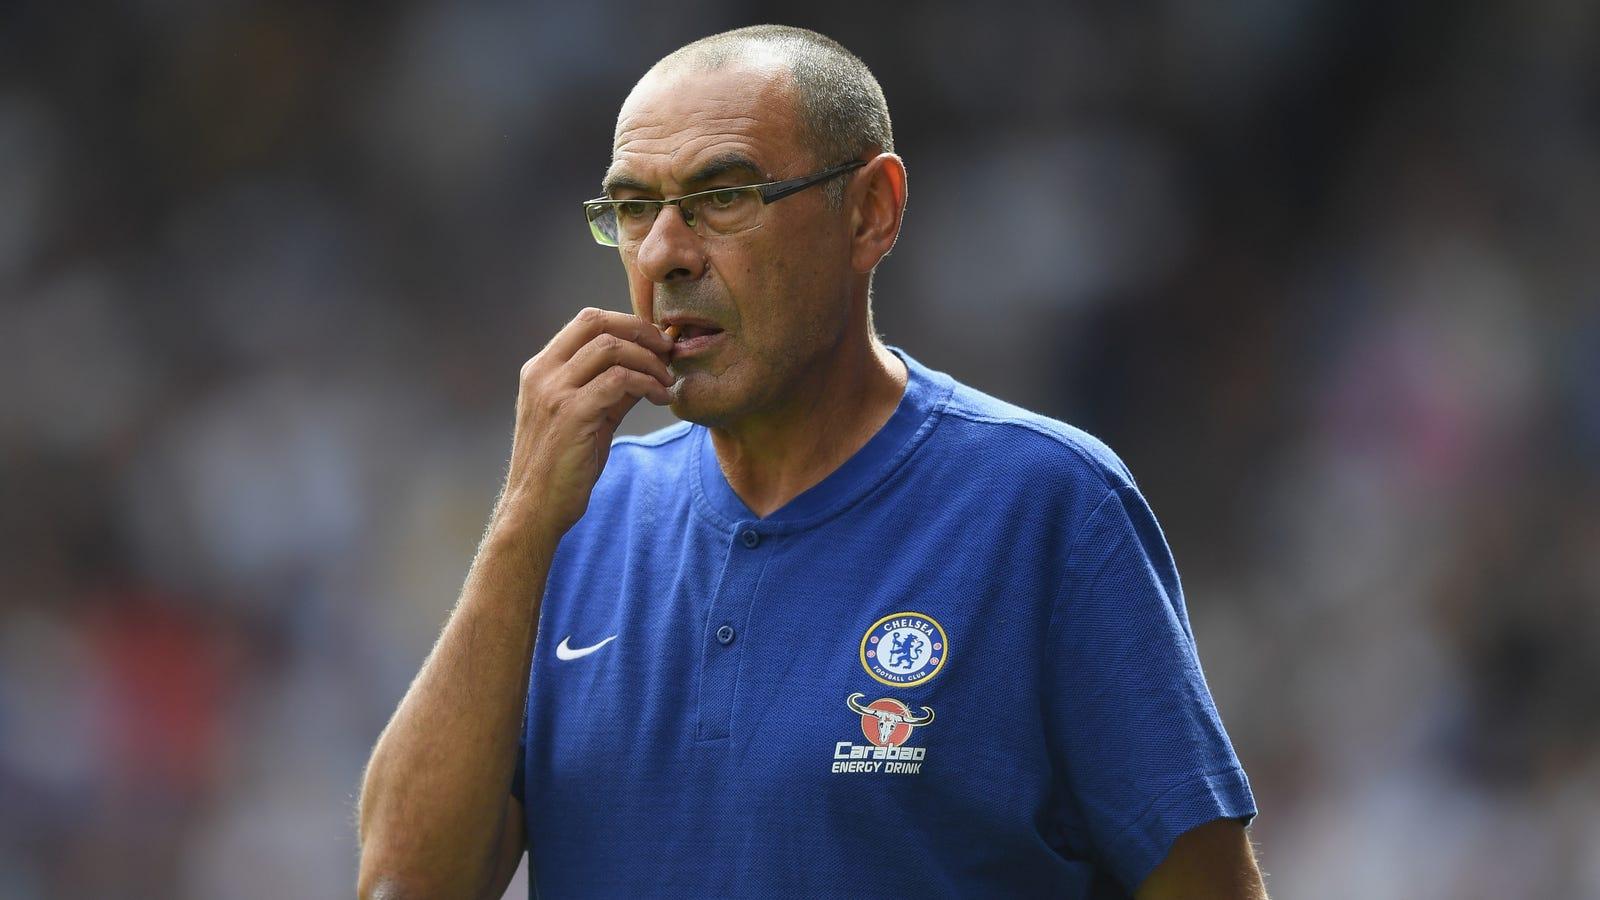 Maurizio Sarri: Chelsea Manager Maurizio Sarri Has A Weird Solution For